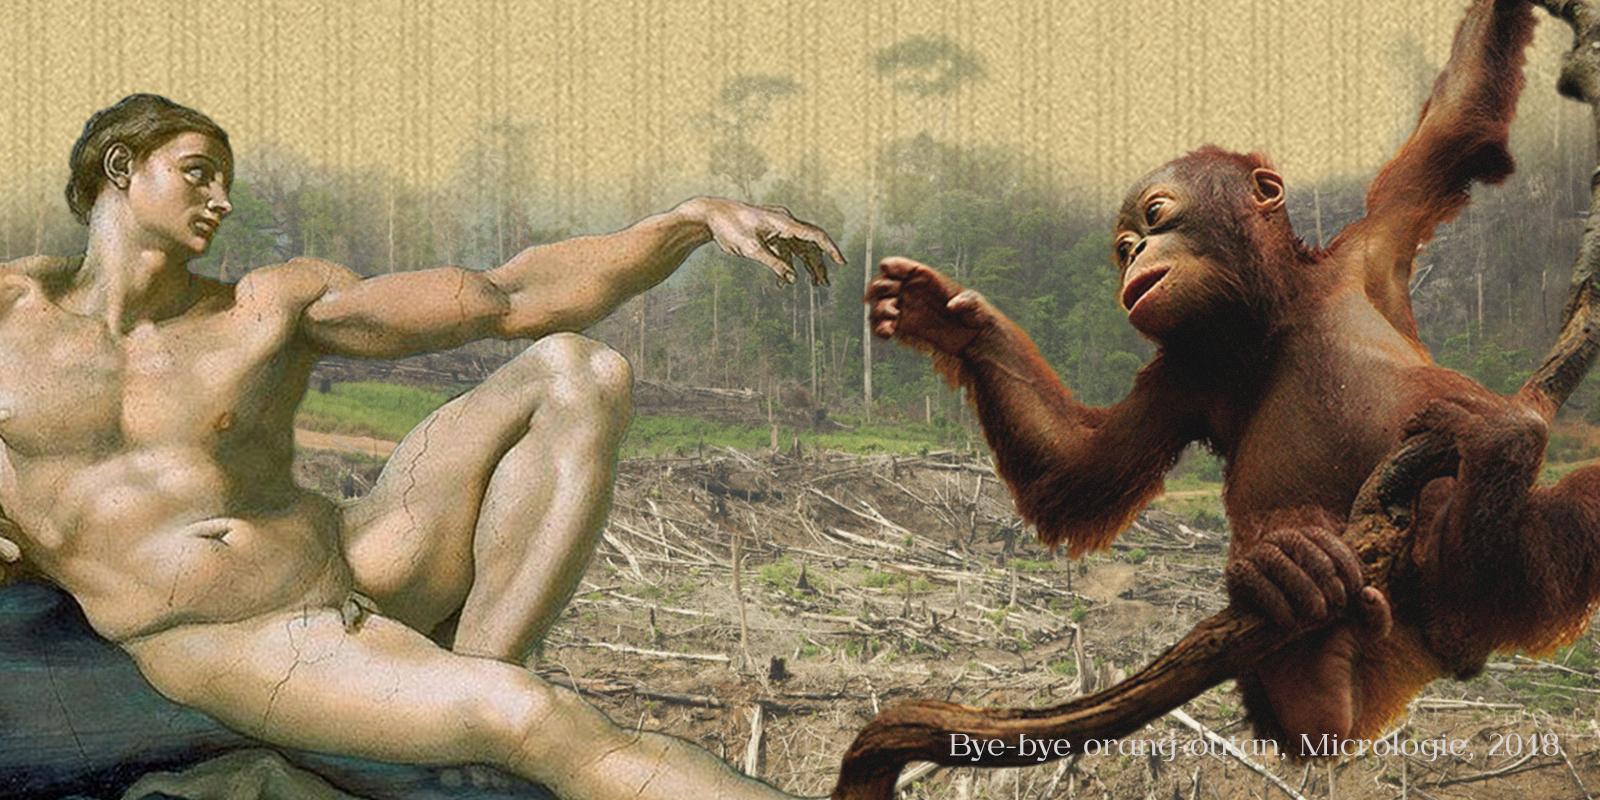 orangs-outans, micrologie